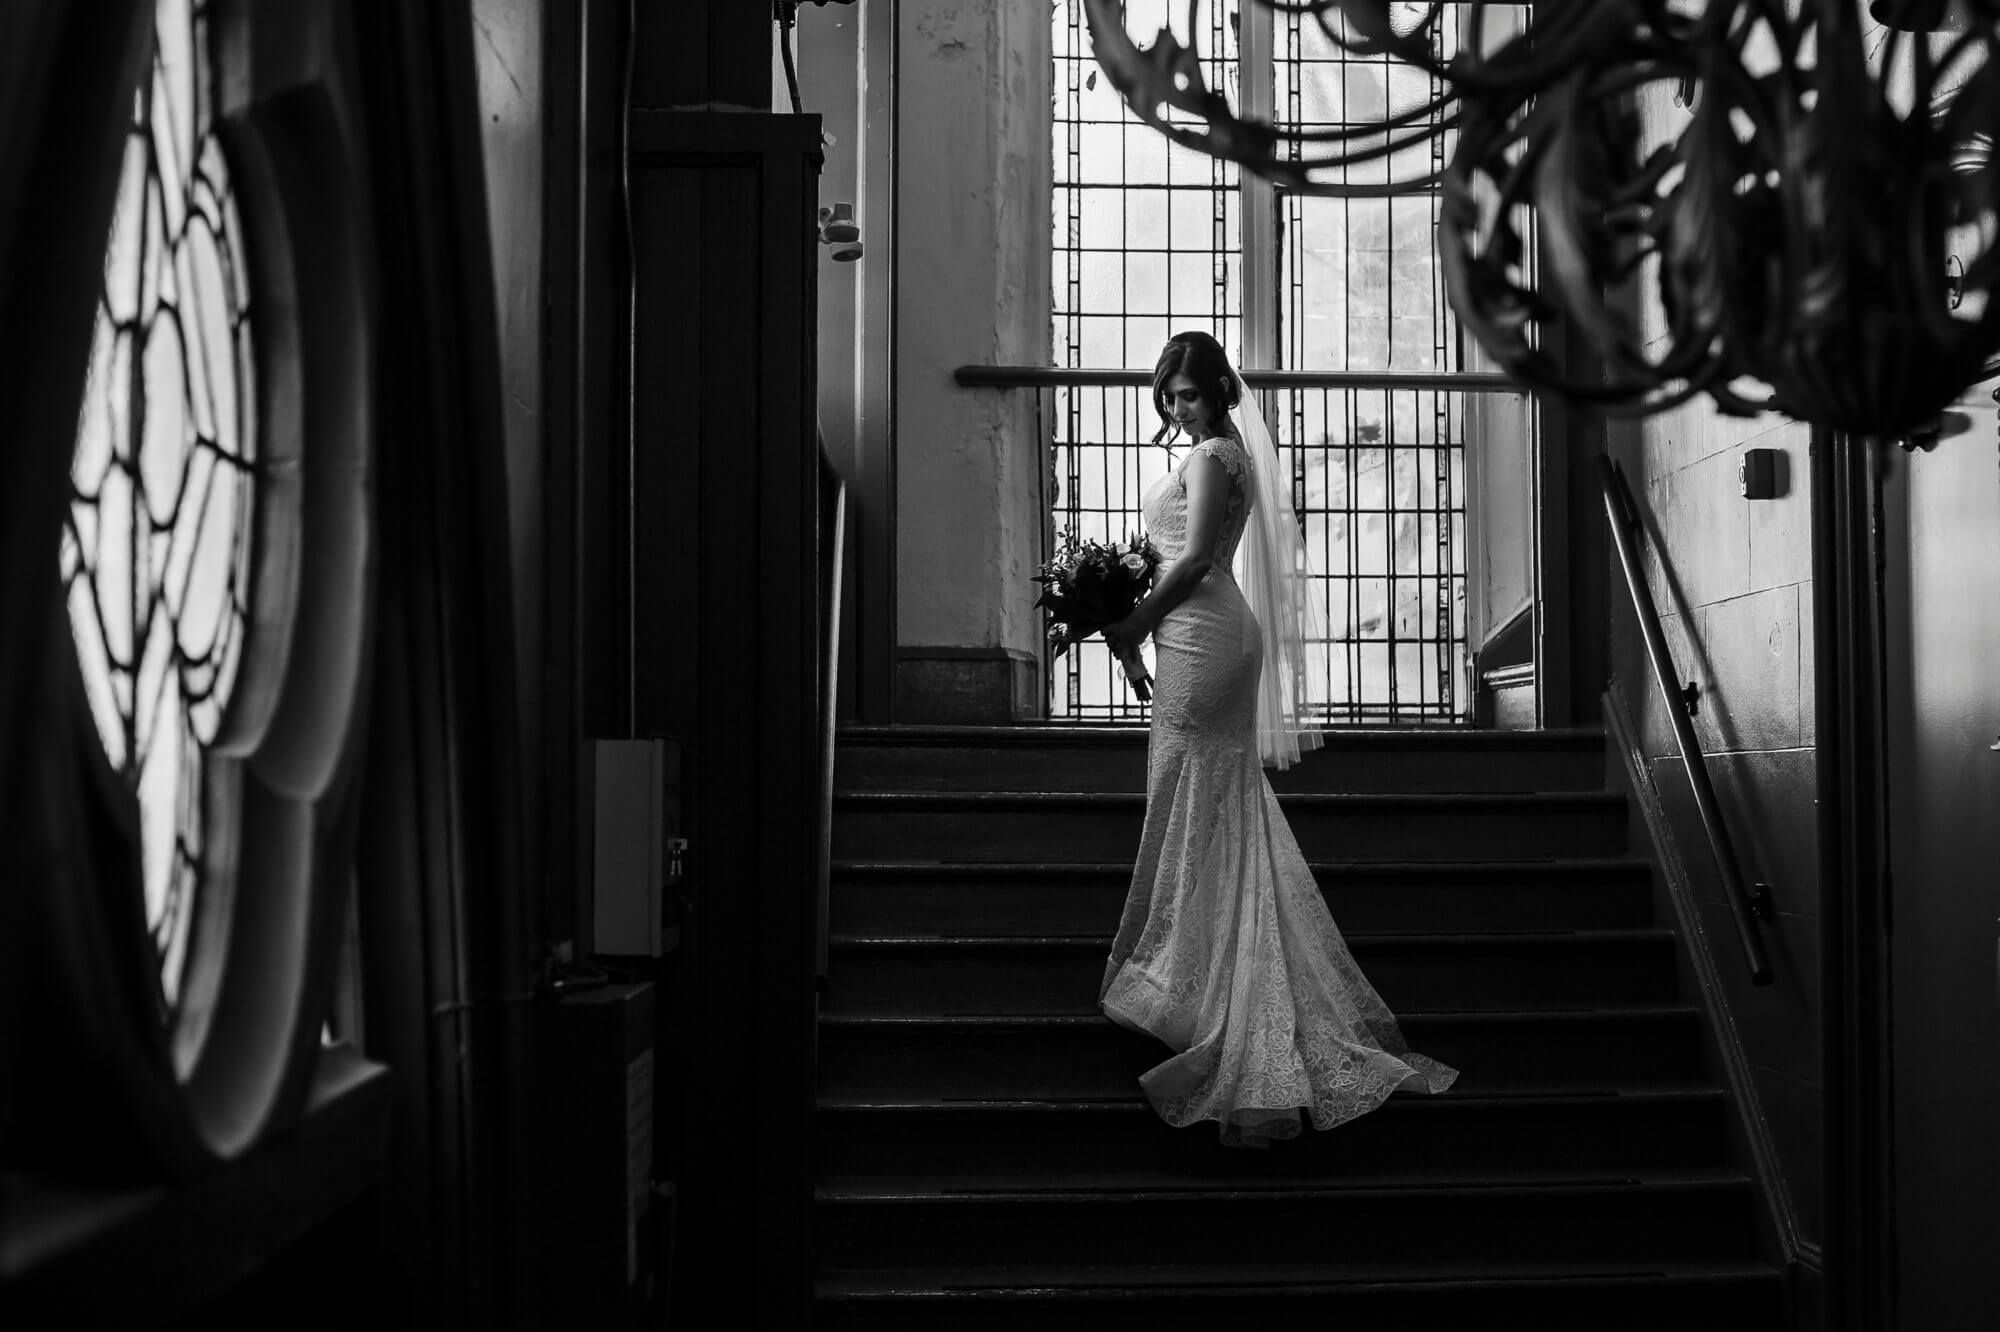 Berkeley Church Wedding Toronto, bridal portrait posed on stairs black and white #bridalportraitposes Berkeley Church Wedding Toronto, bridal portrait posed on stairs black and white #bridalportraitposes